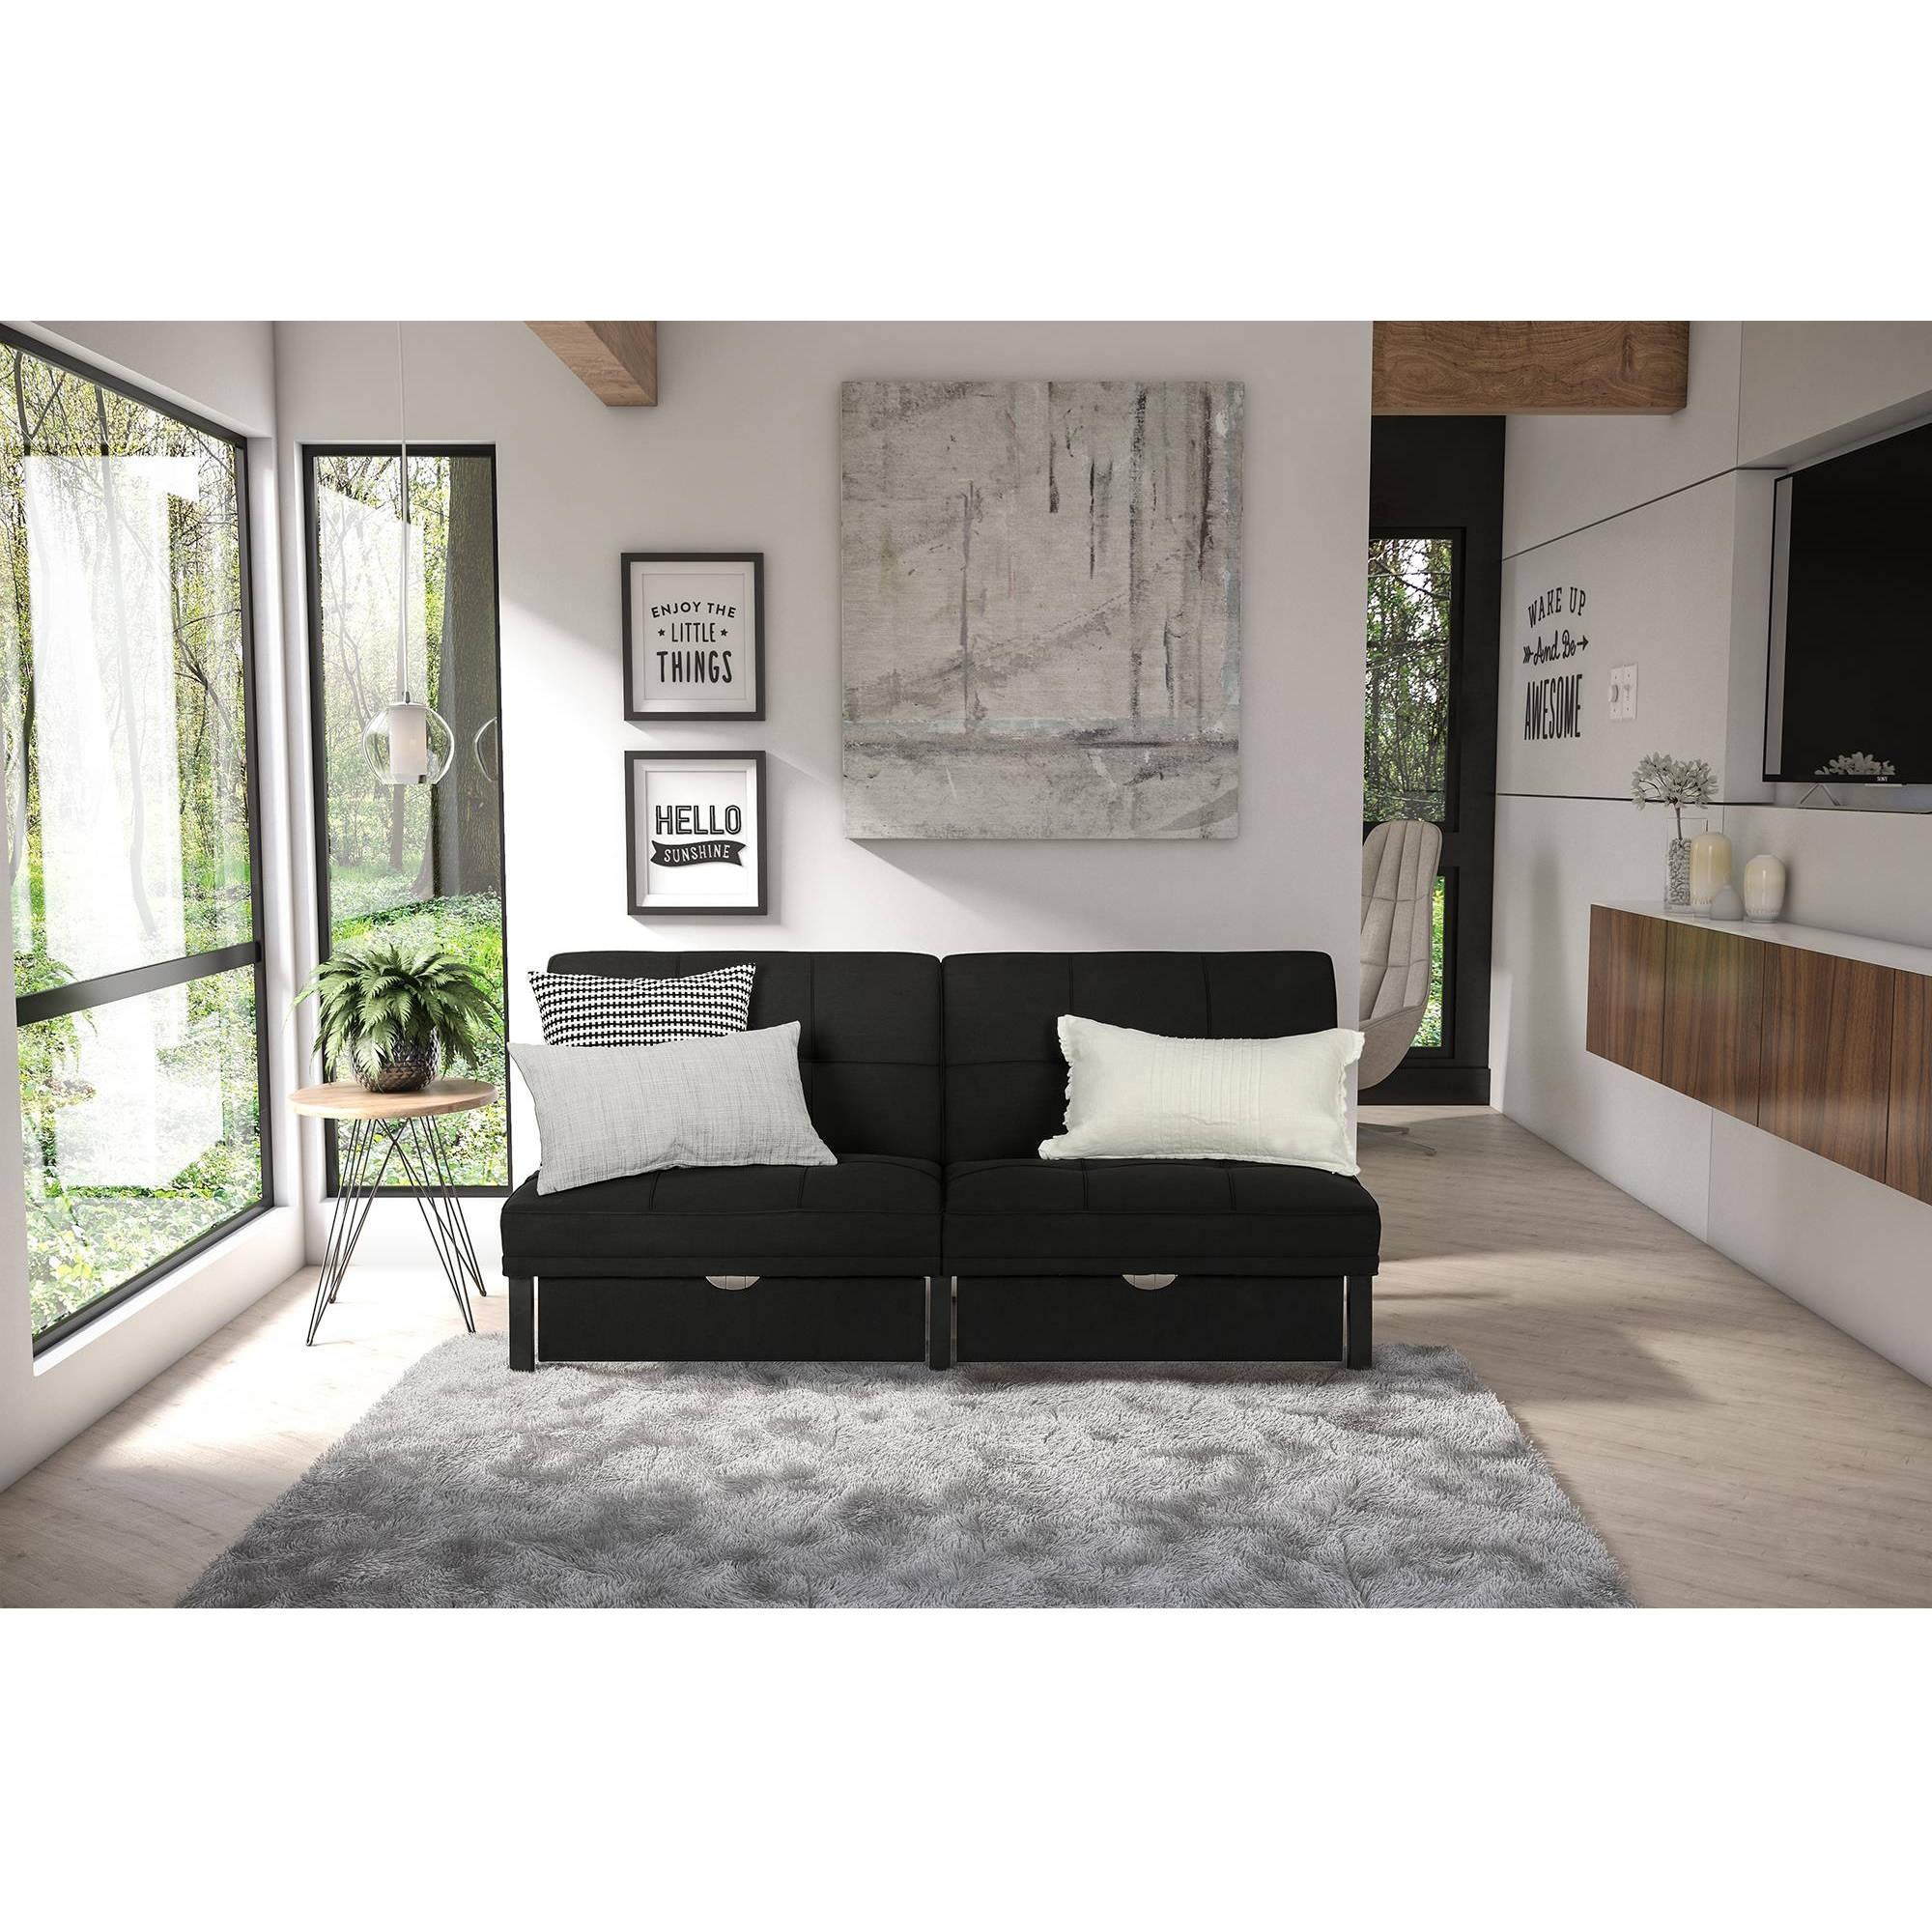 DHP Skye Storage Futon, Black Linen by Dorel Home Products